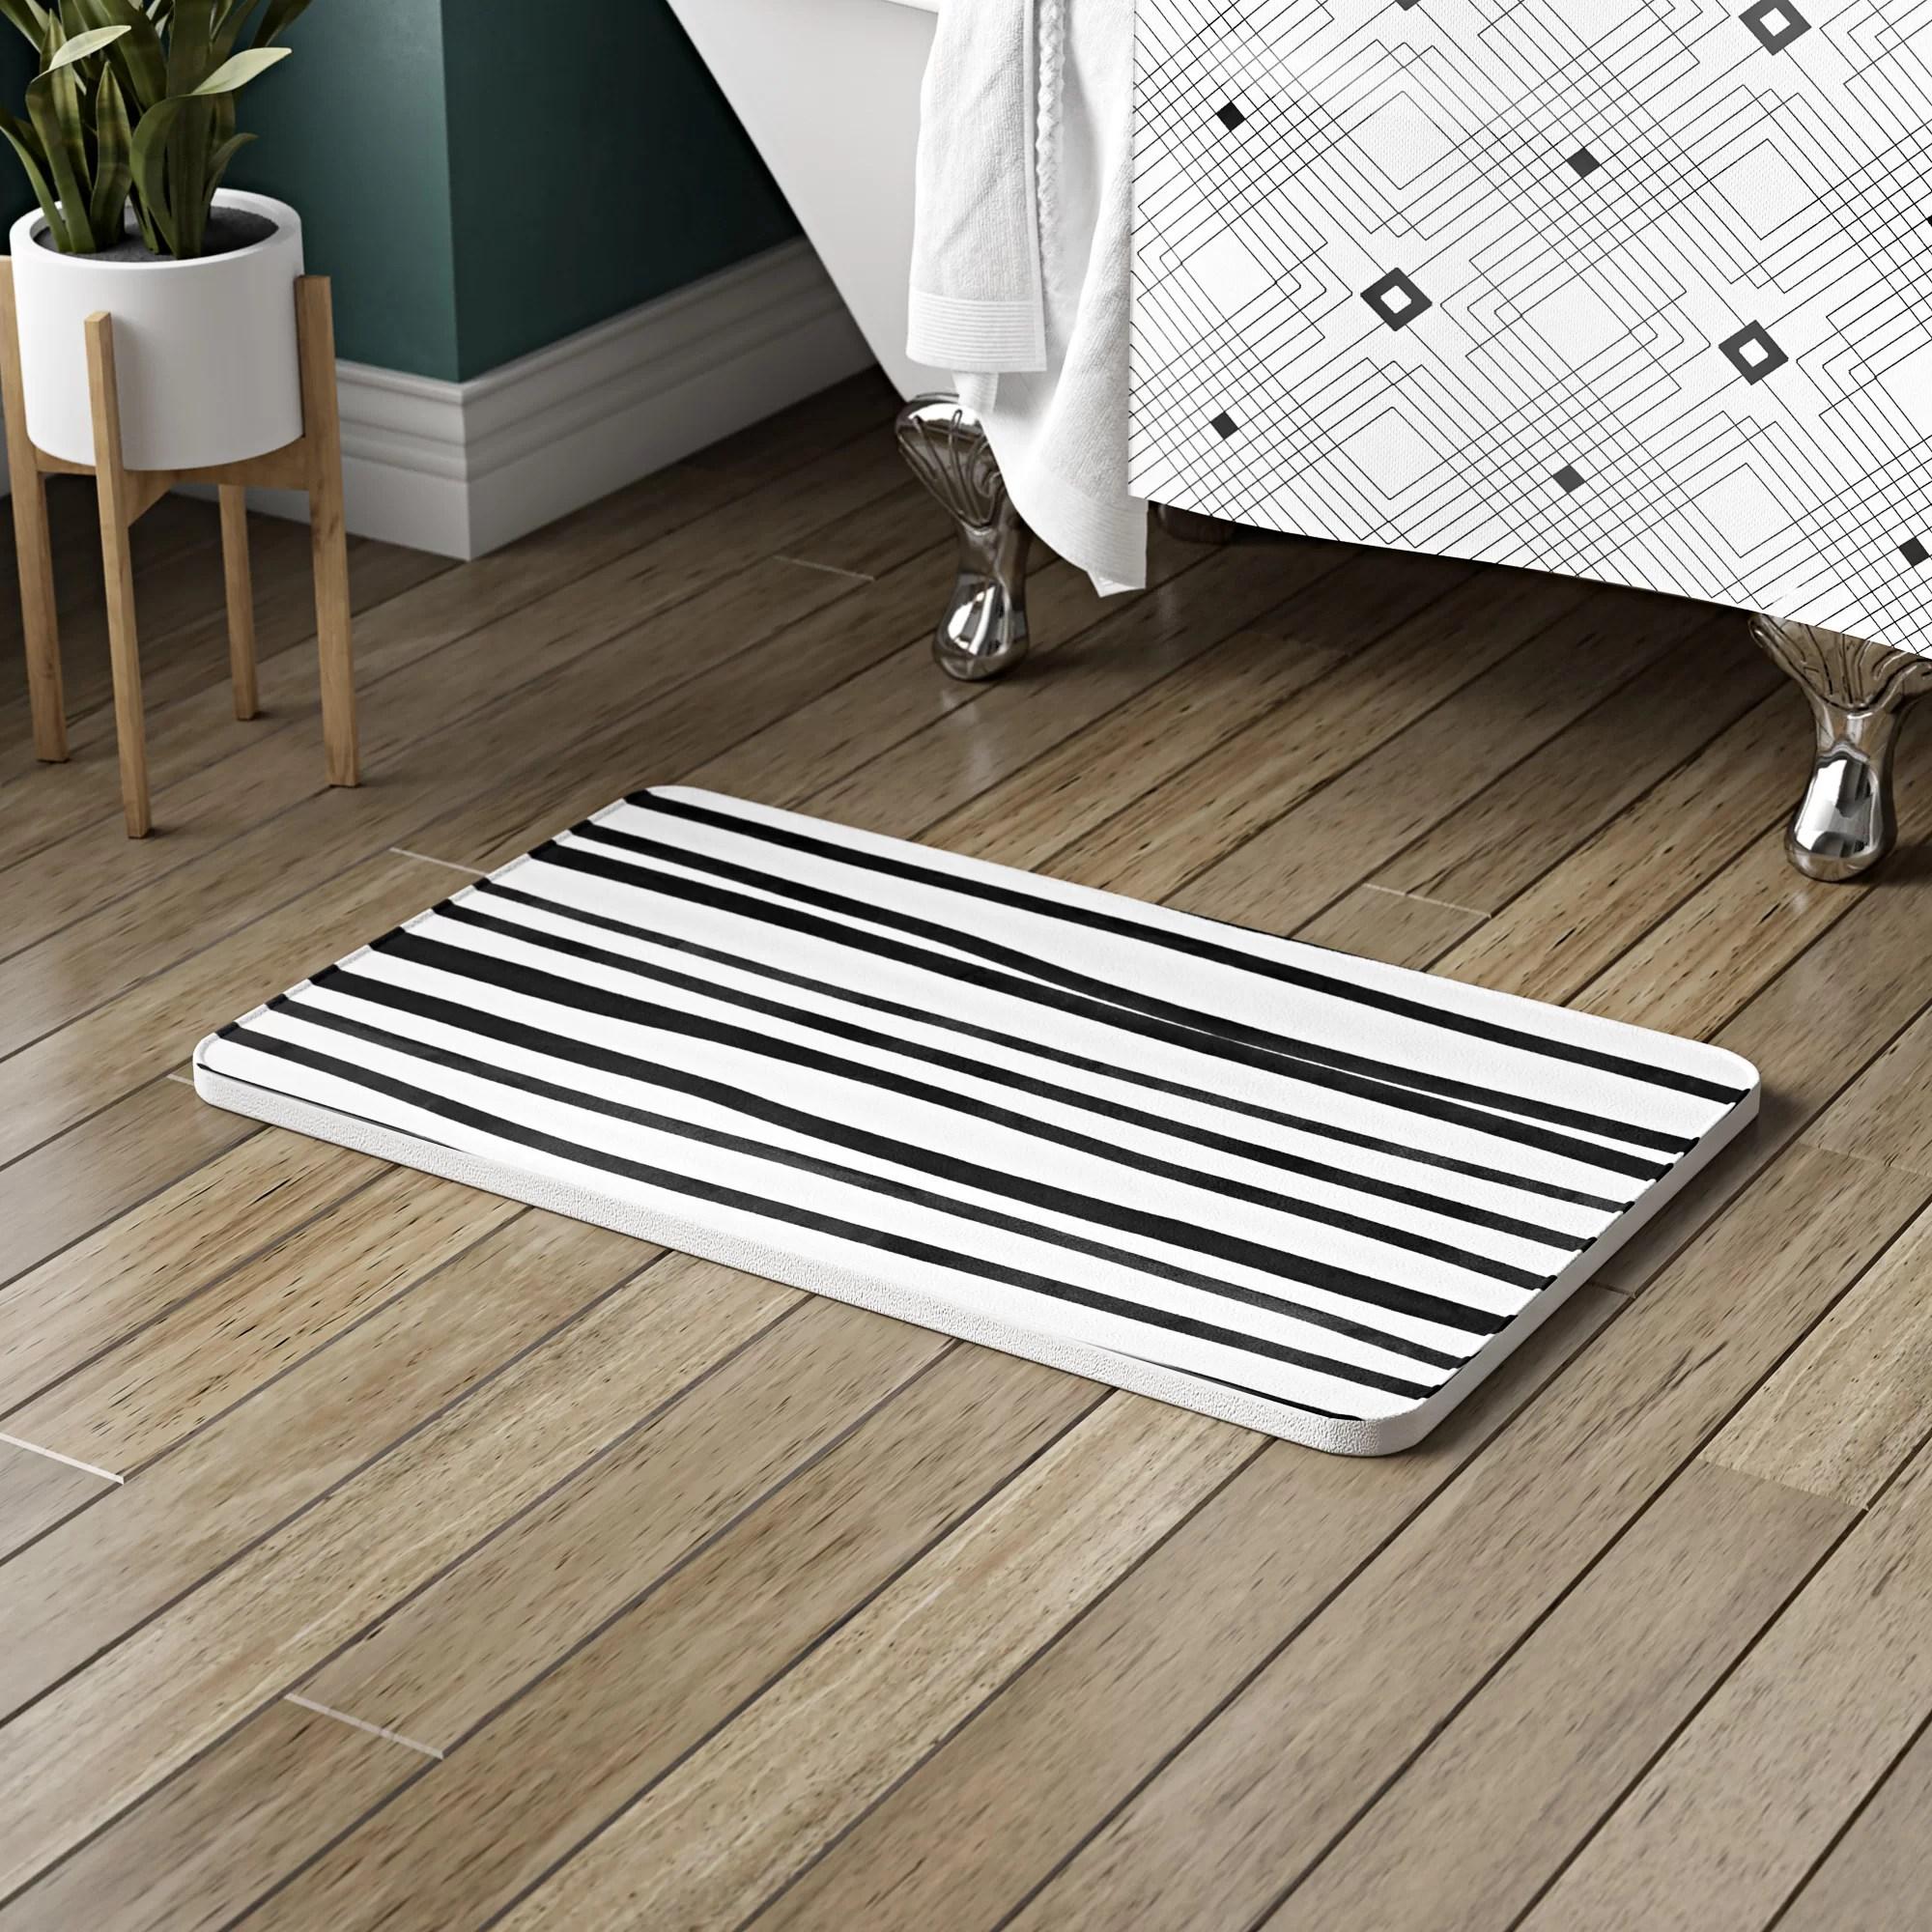 Ivy Bronx Bretz Stripes Rectangle Non Slip Striped Bath Rug